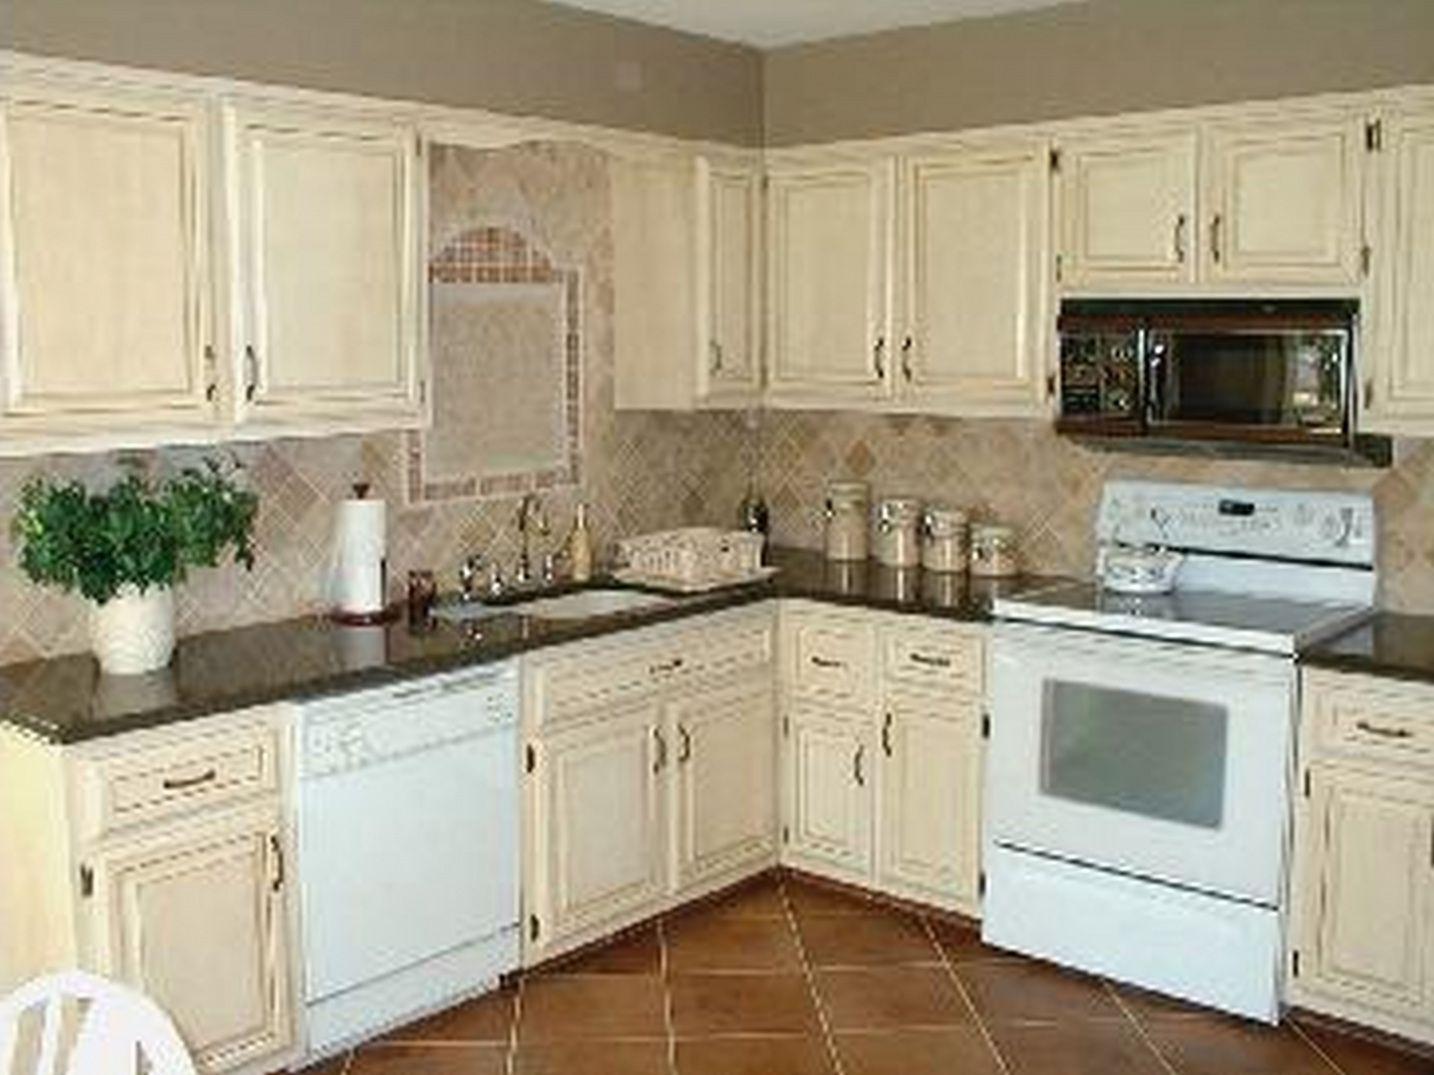 2018 Painting Kitchen Cabinets Antique White - Decorative Kitchen ...